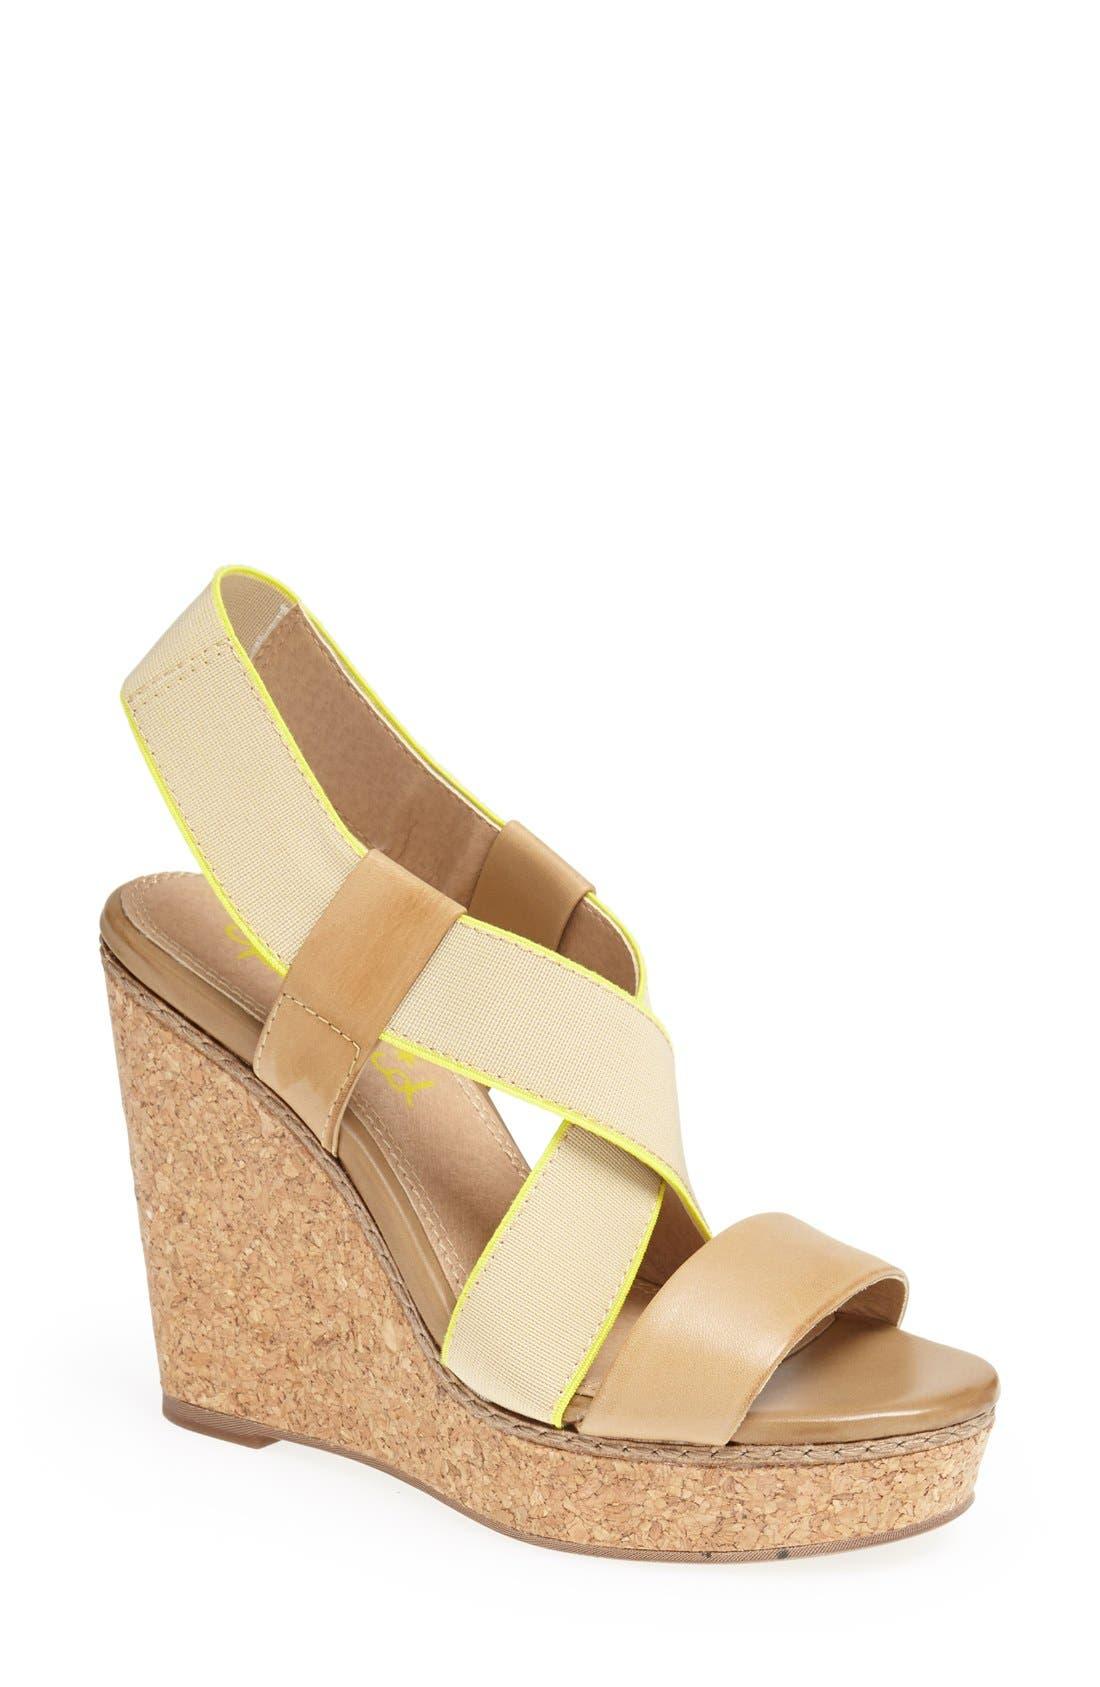 Main Image - Splendid 'Kellen' Sandal (Women)